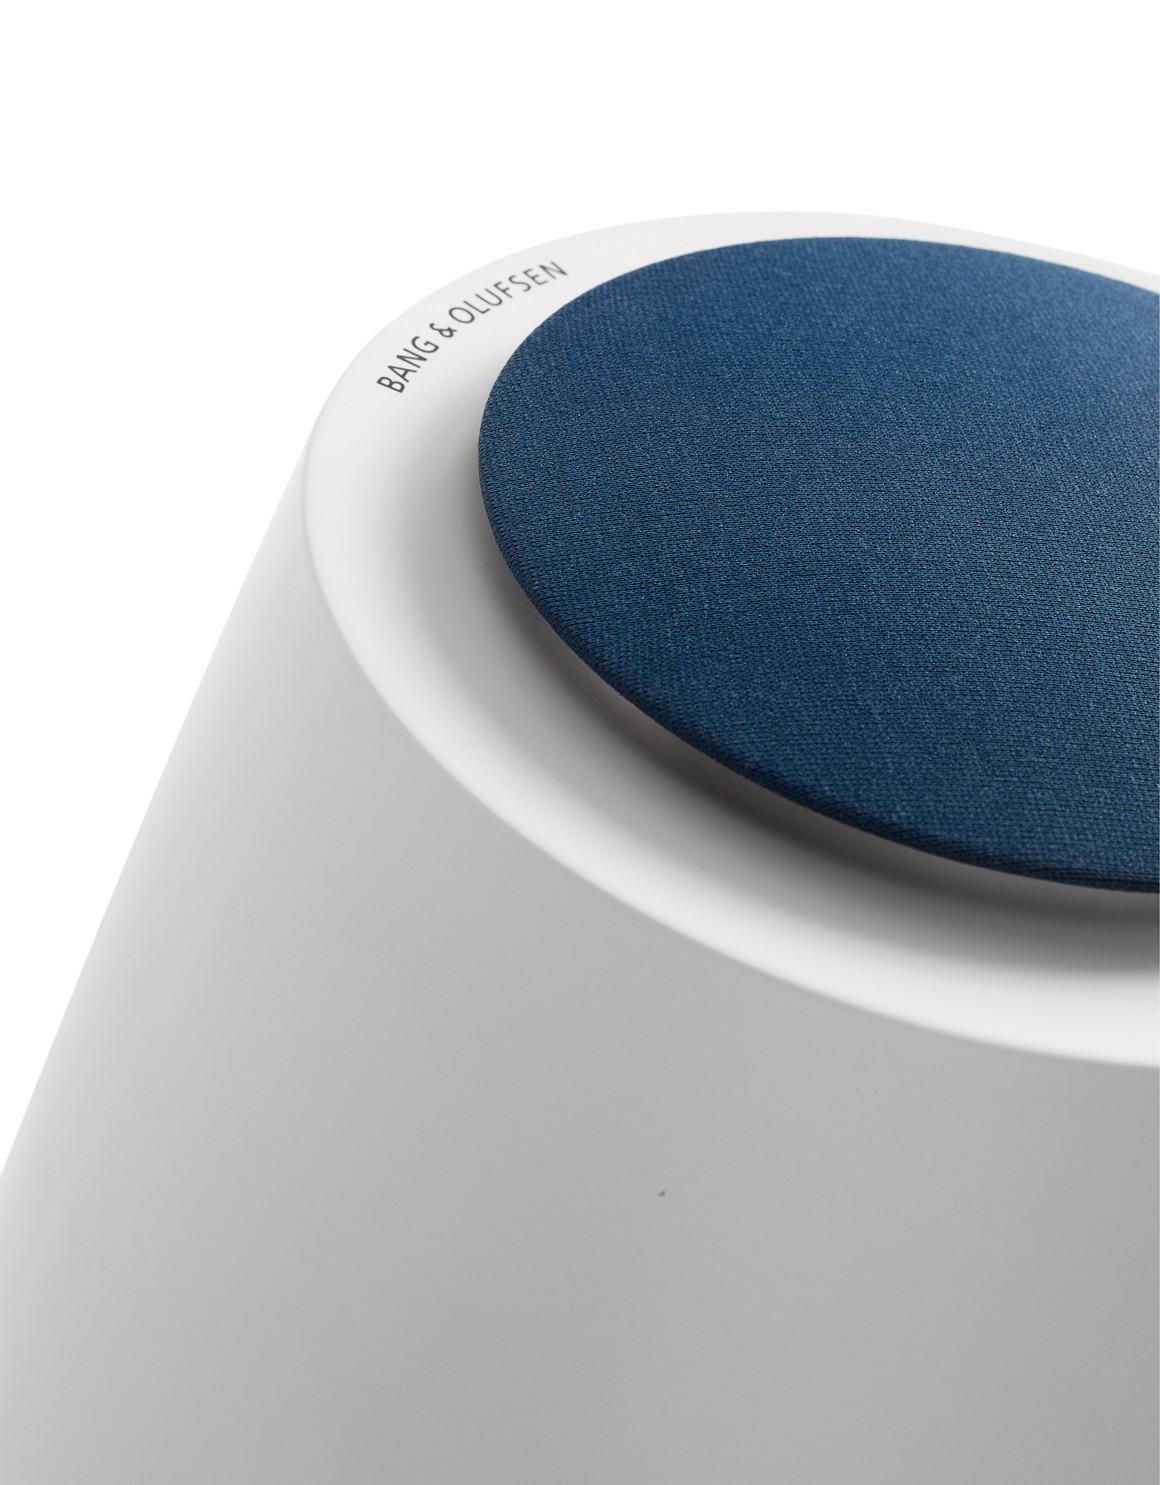 Cover für BeoLab 14 / BeoPlay S8 Lautsprecher System